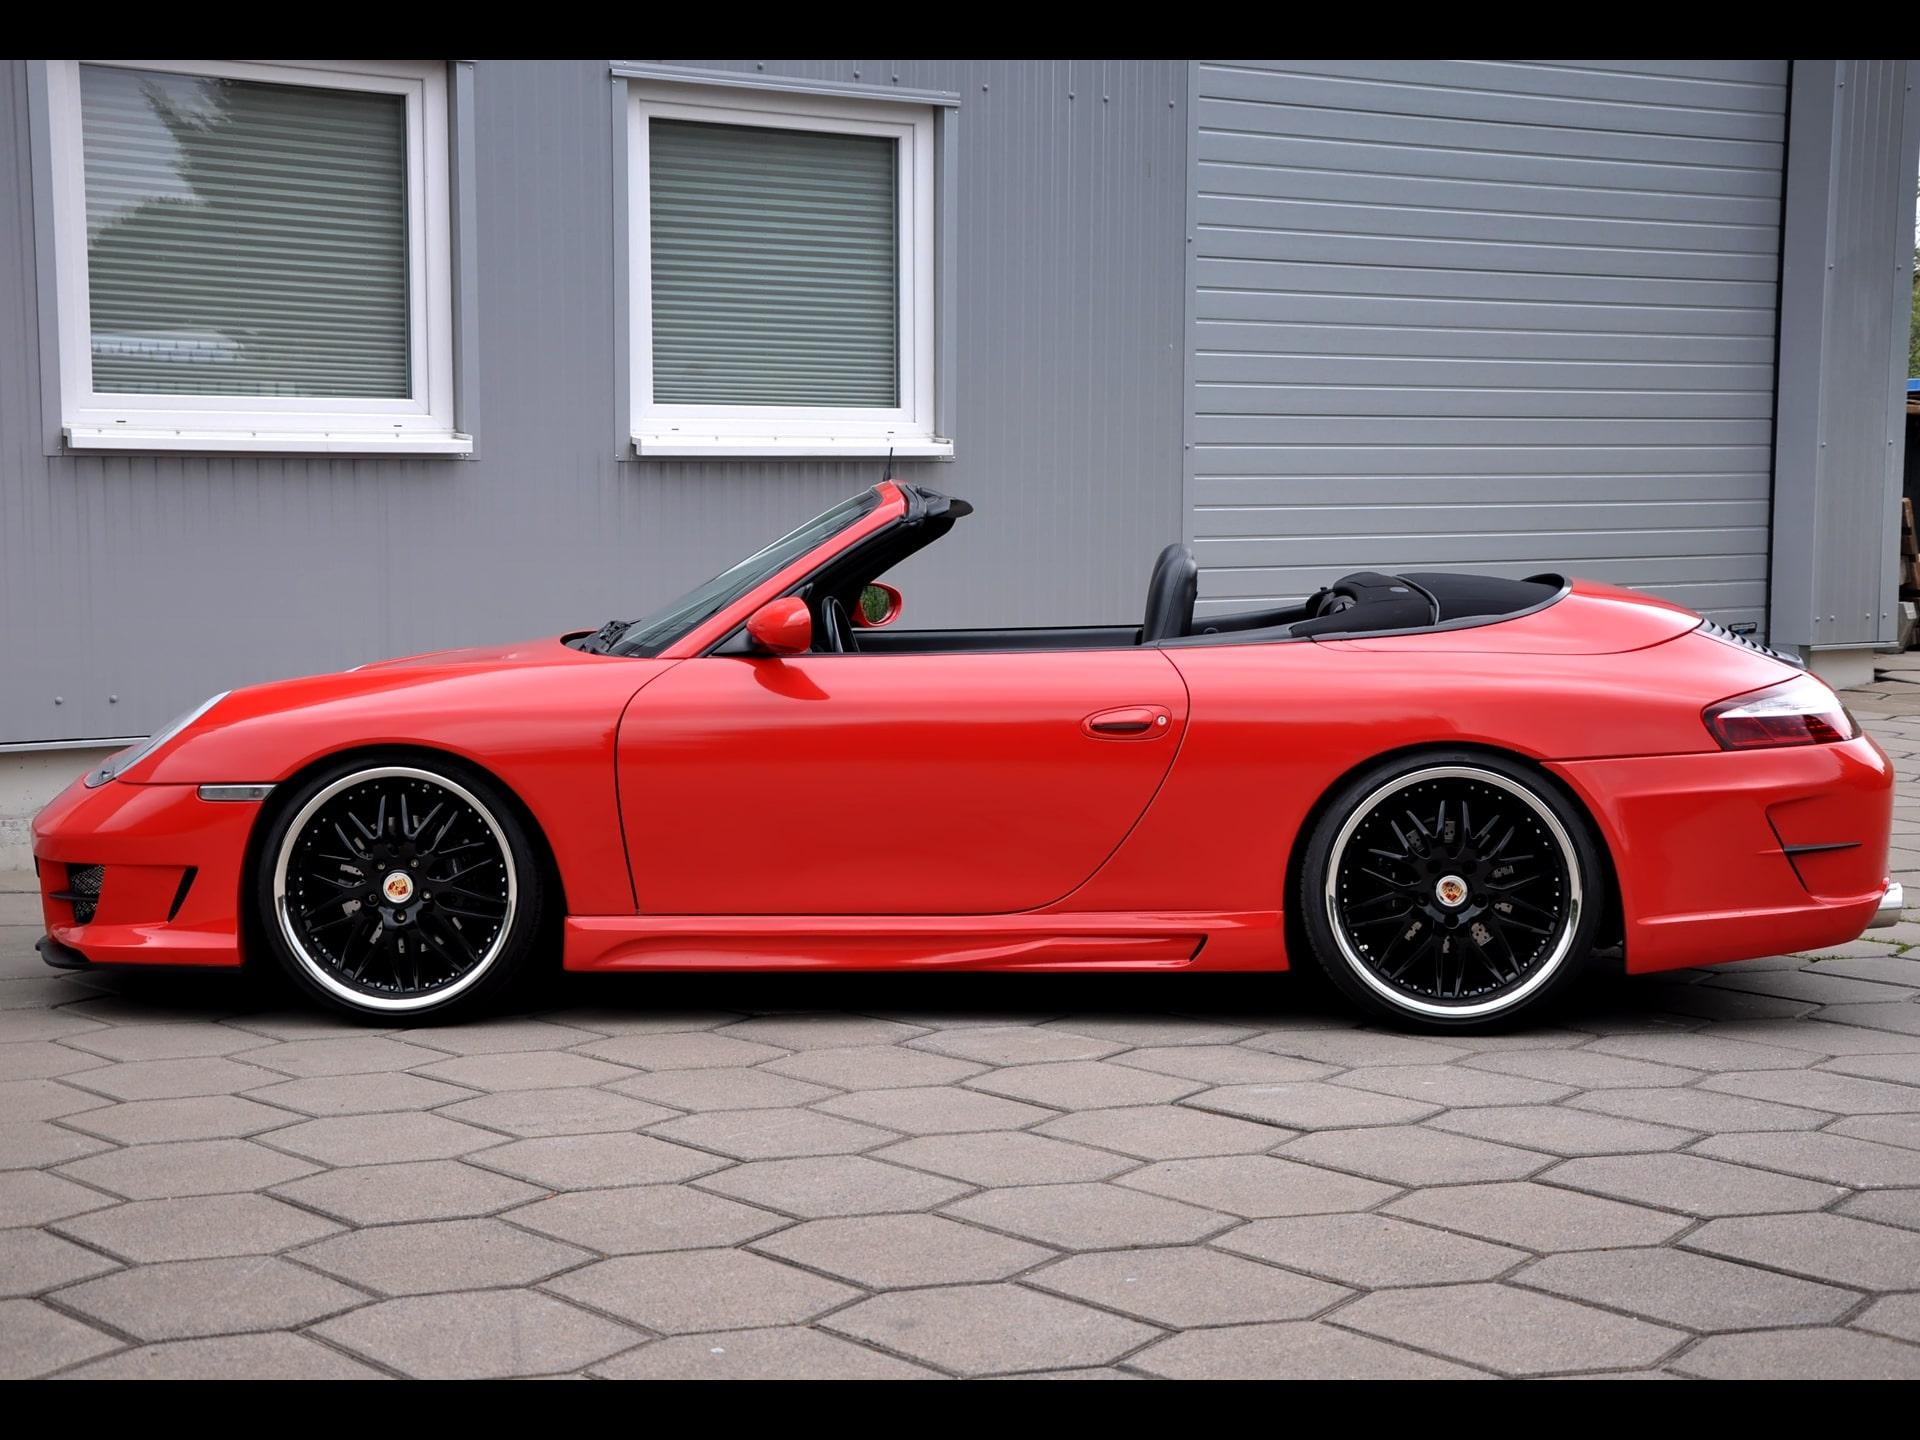 Porsche 911 996 1 Tuning Pd1 Aerodynamic Kit Body Kit M D Exclusive Cardesign